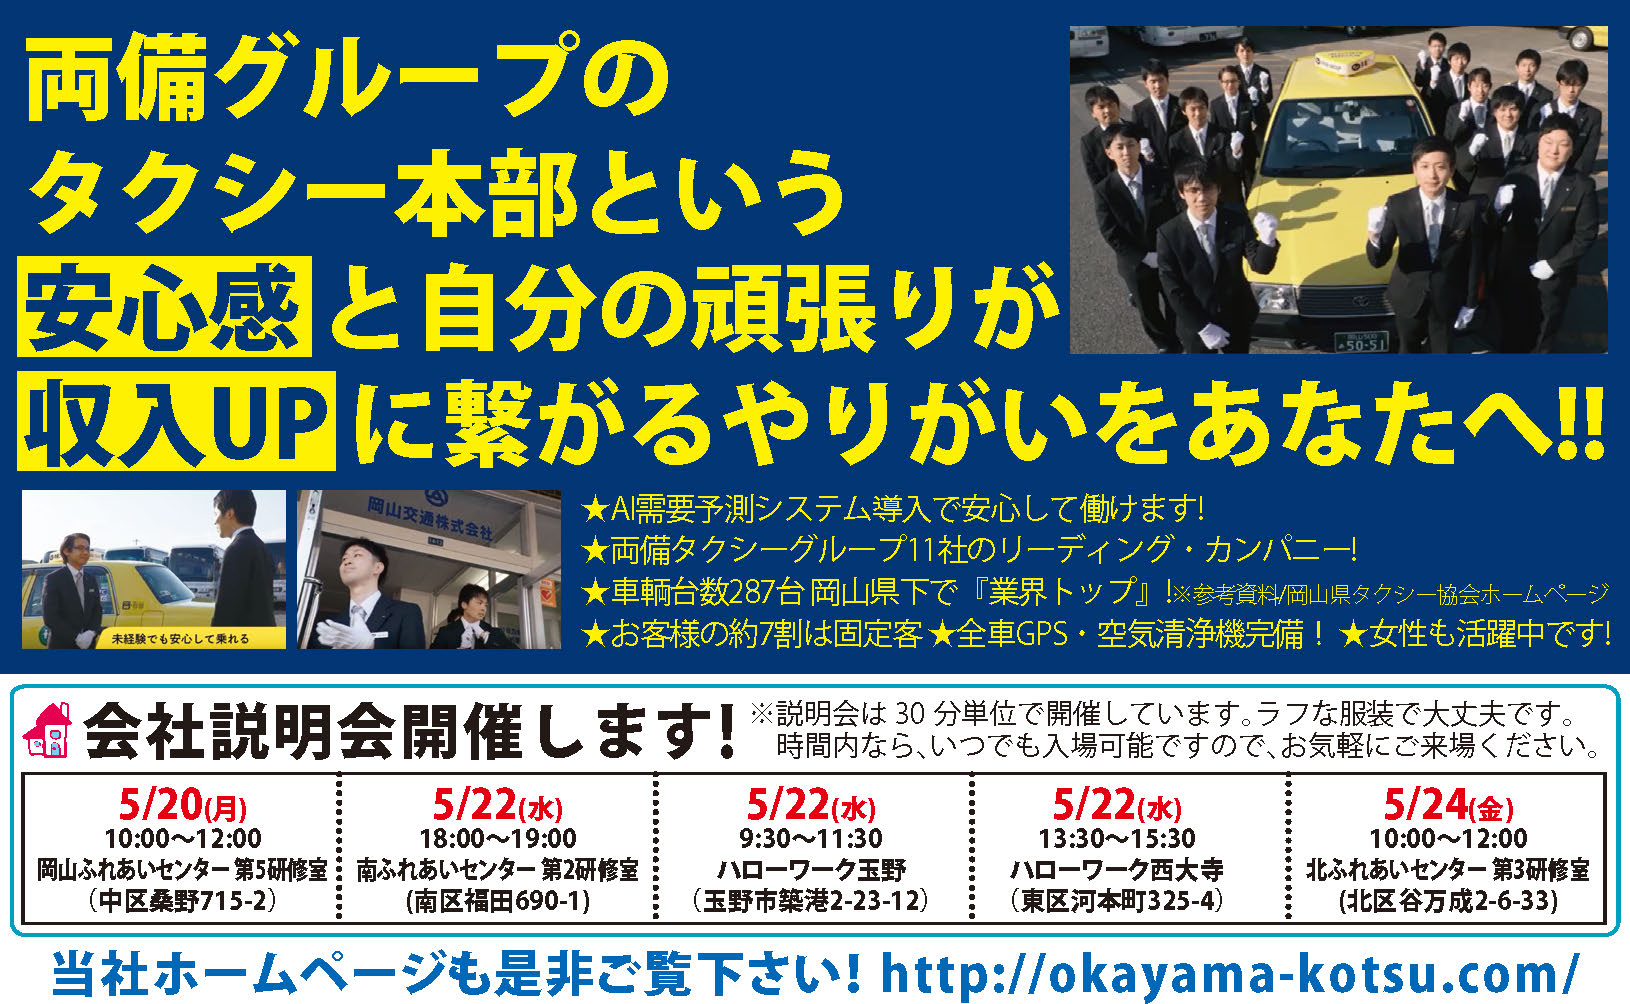 岡山交通株式会社(両備グループ)男女岡山交通乗務担当社員〔高収入可能です〕画像